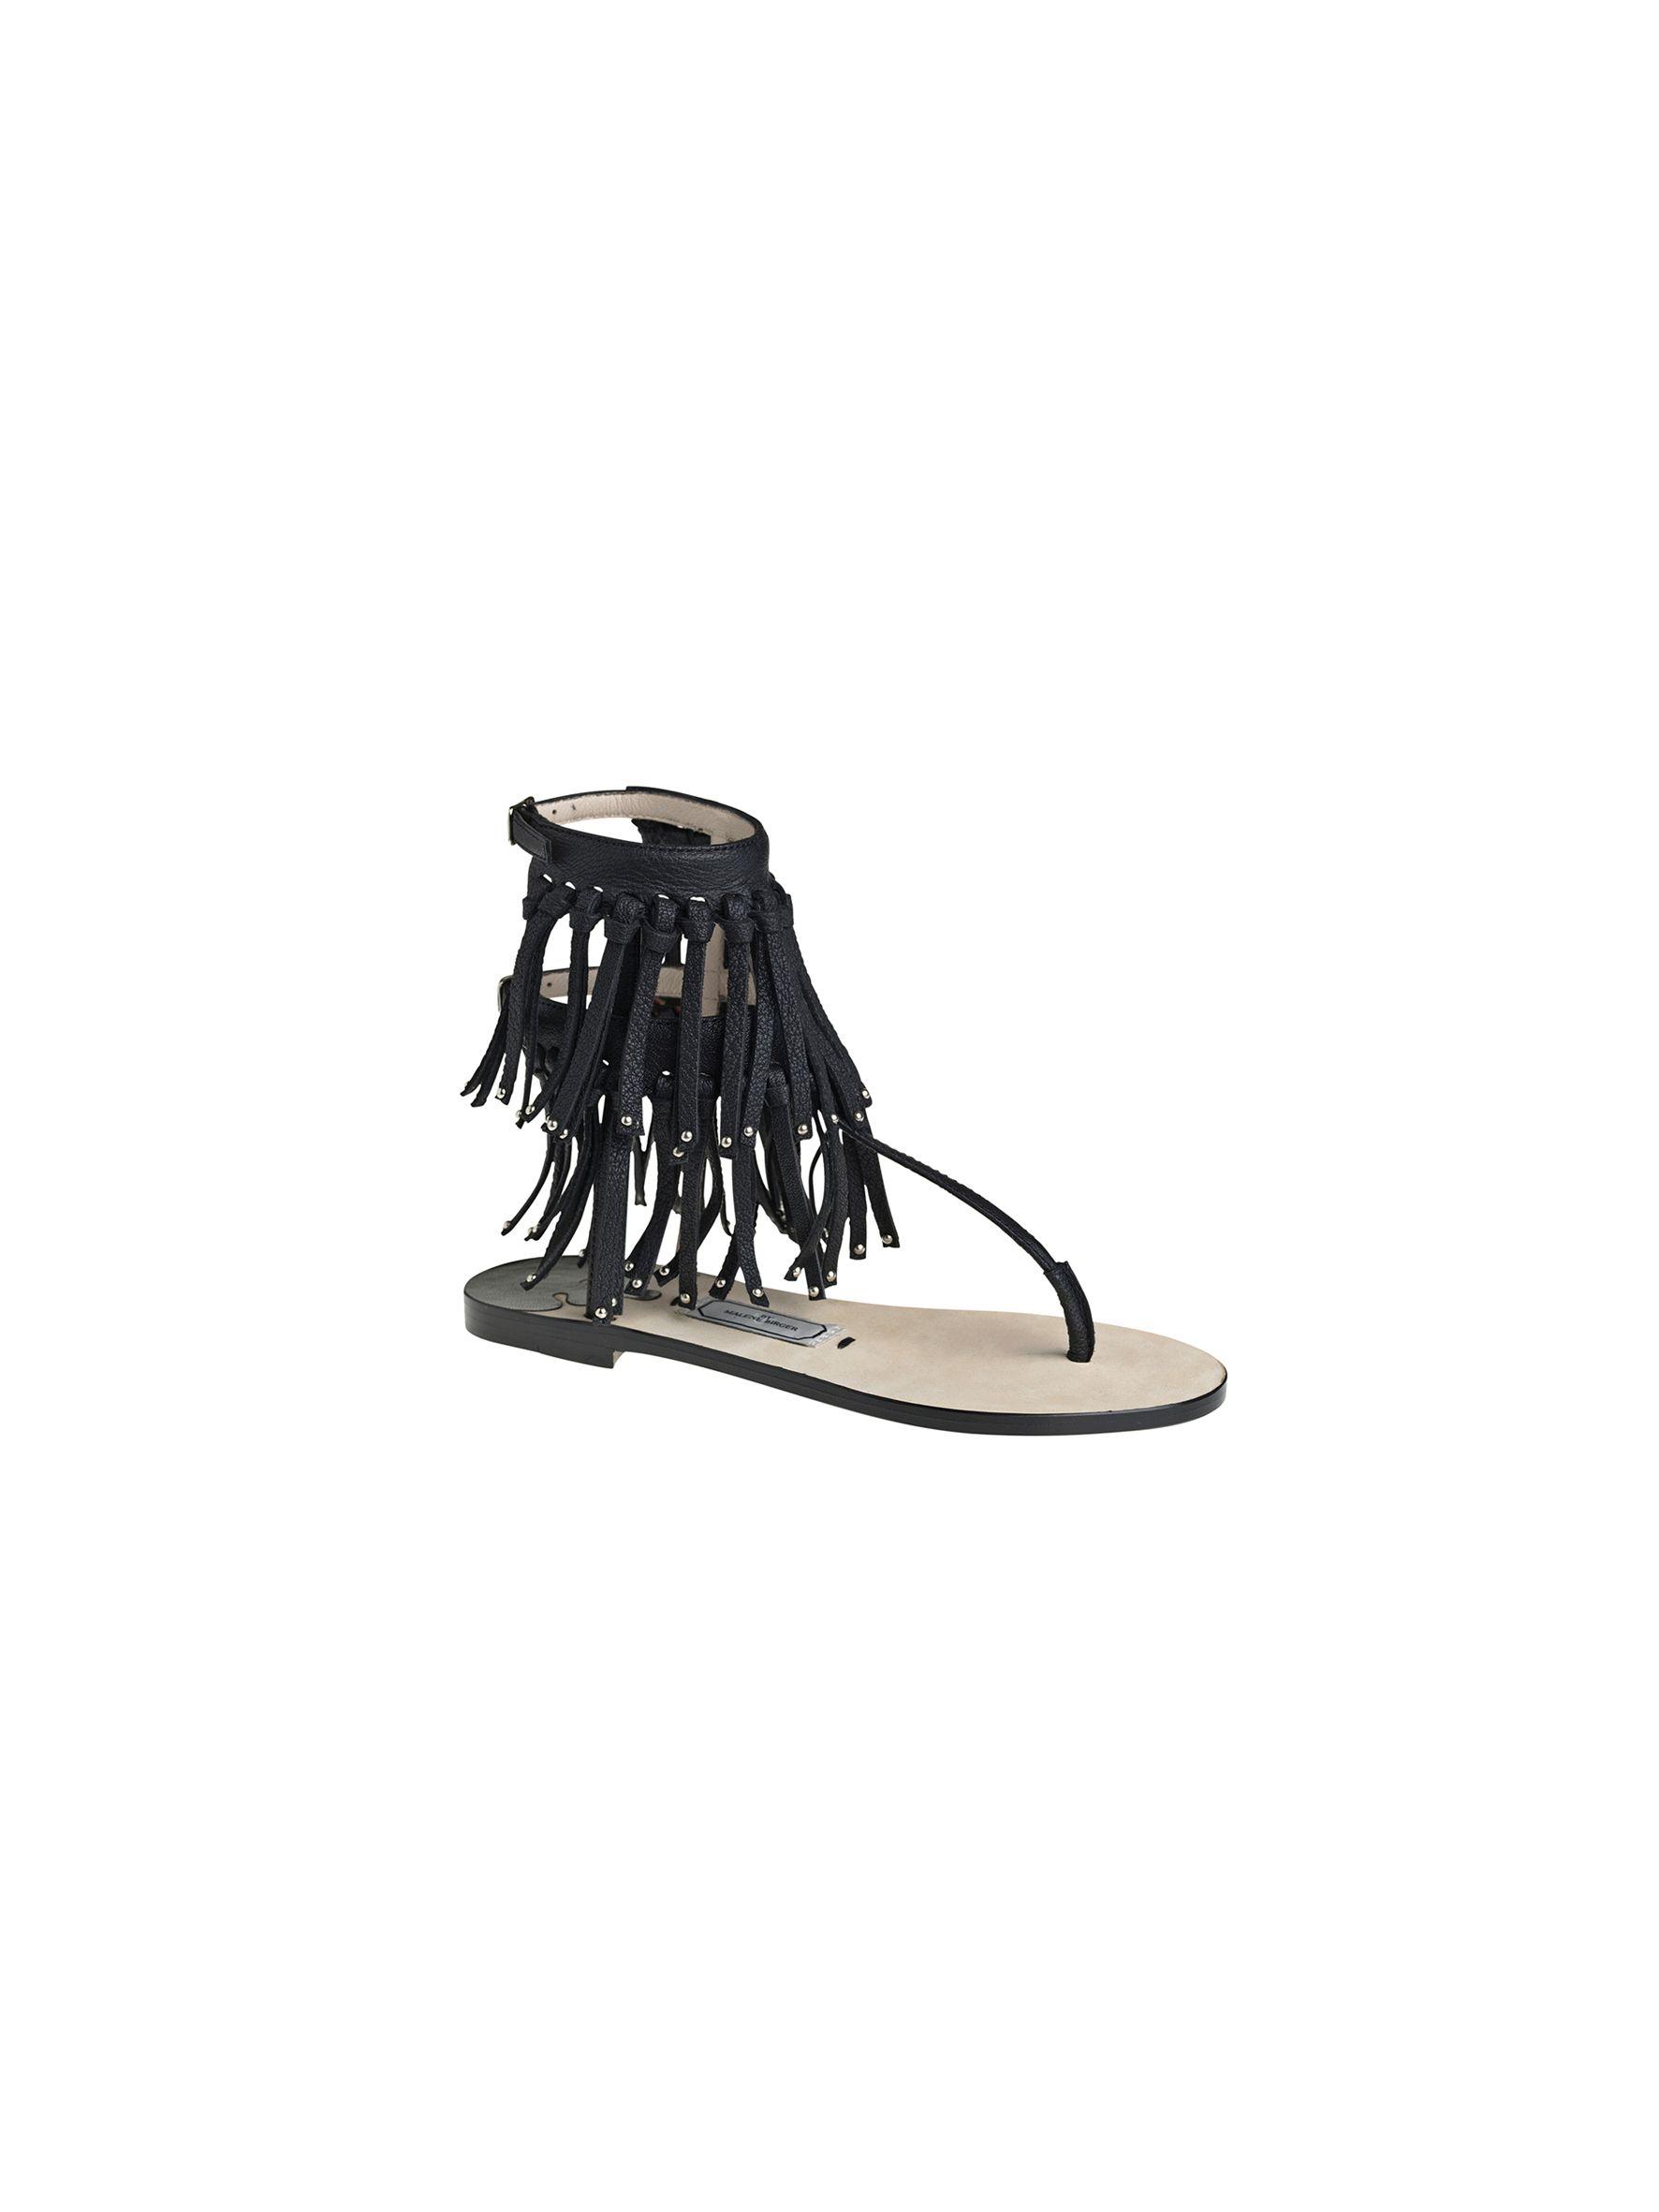 Nuntaga Shoes - By Malene Birger Spring Summer 2015 - Women's fashion